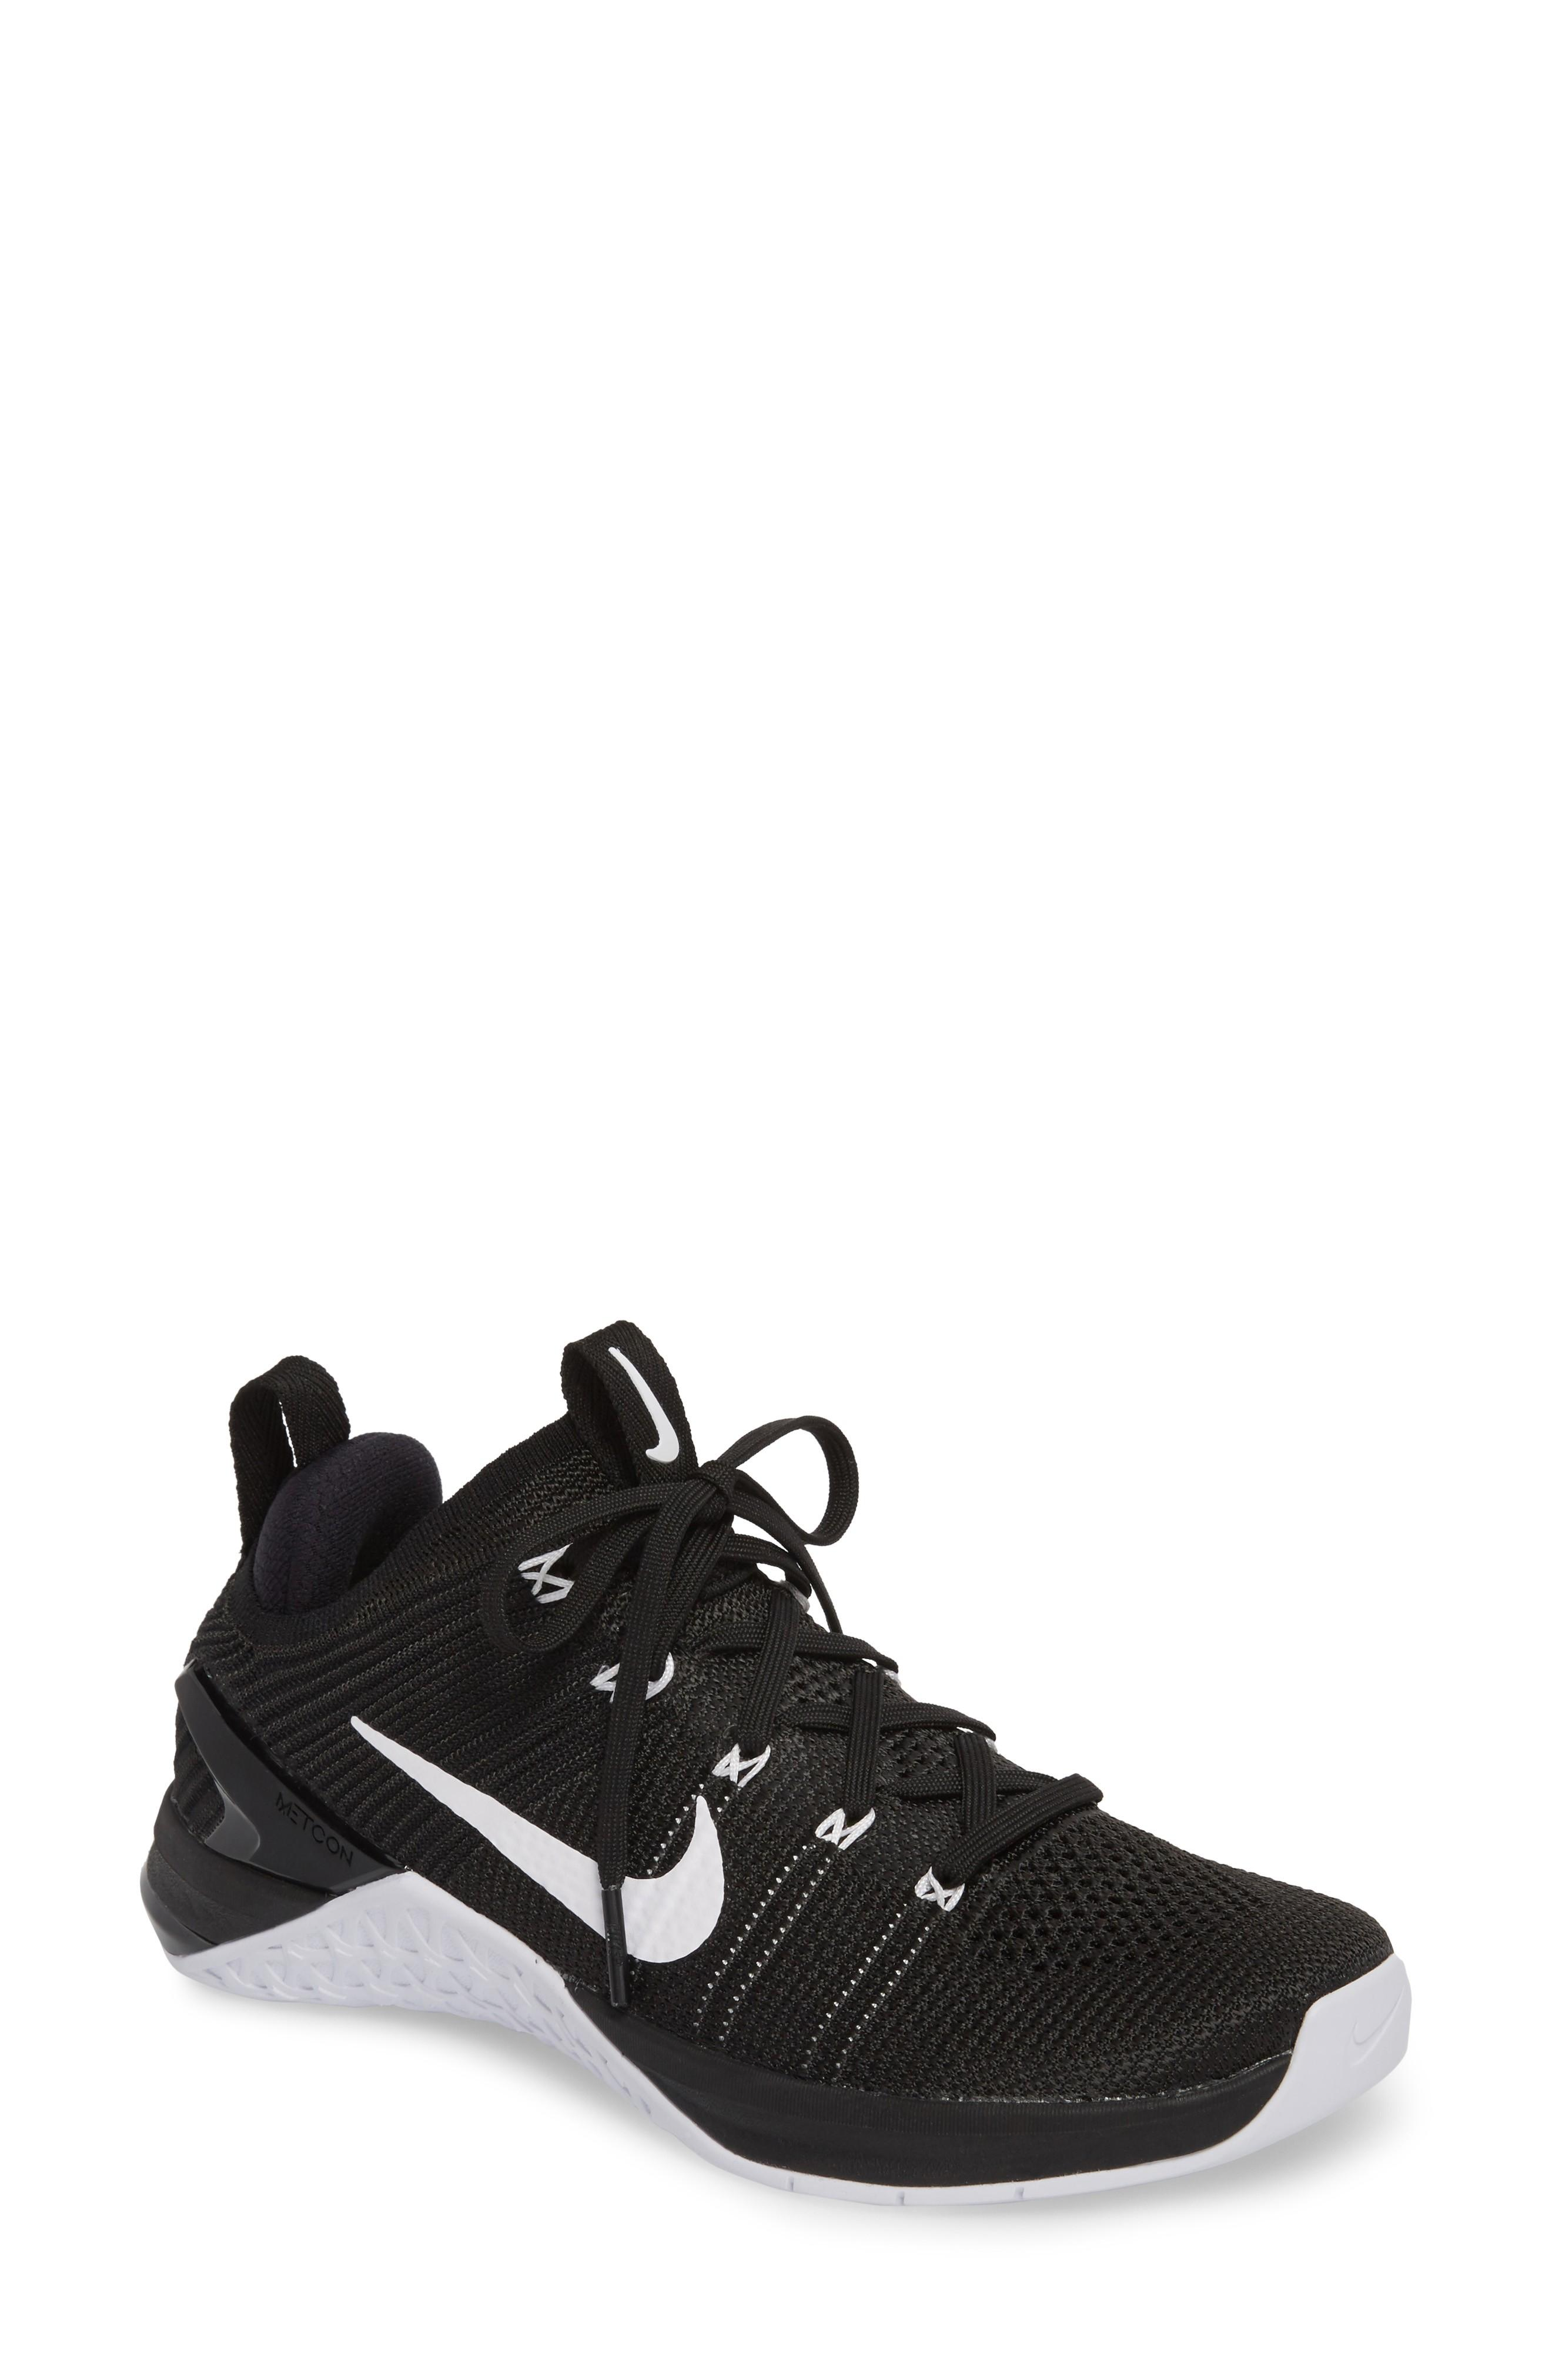 fa3da07617aa8 Nike Metcon Dsx Flyknit 2 Training Shoe In Black | ModeSens